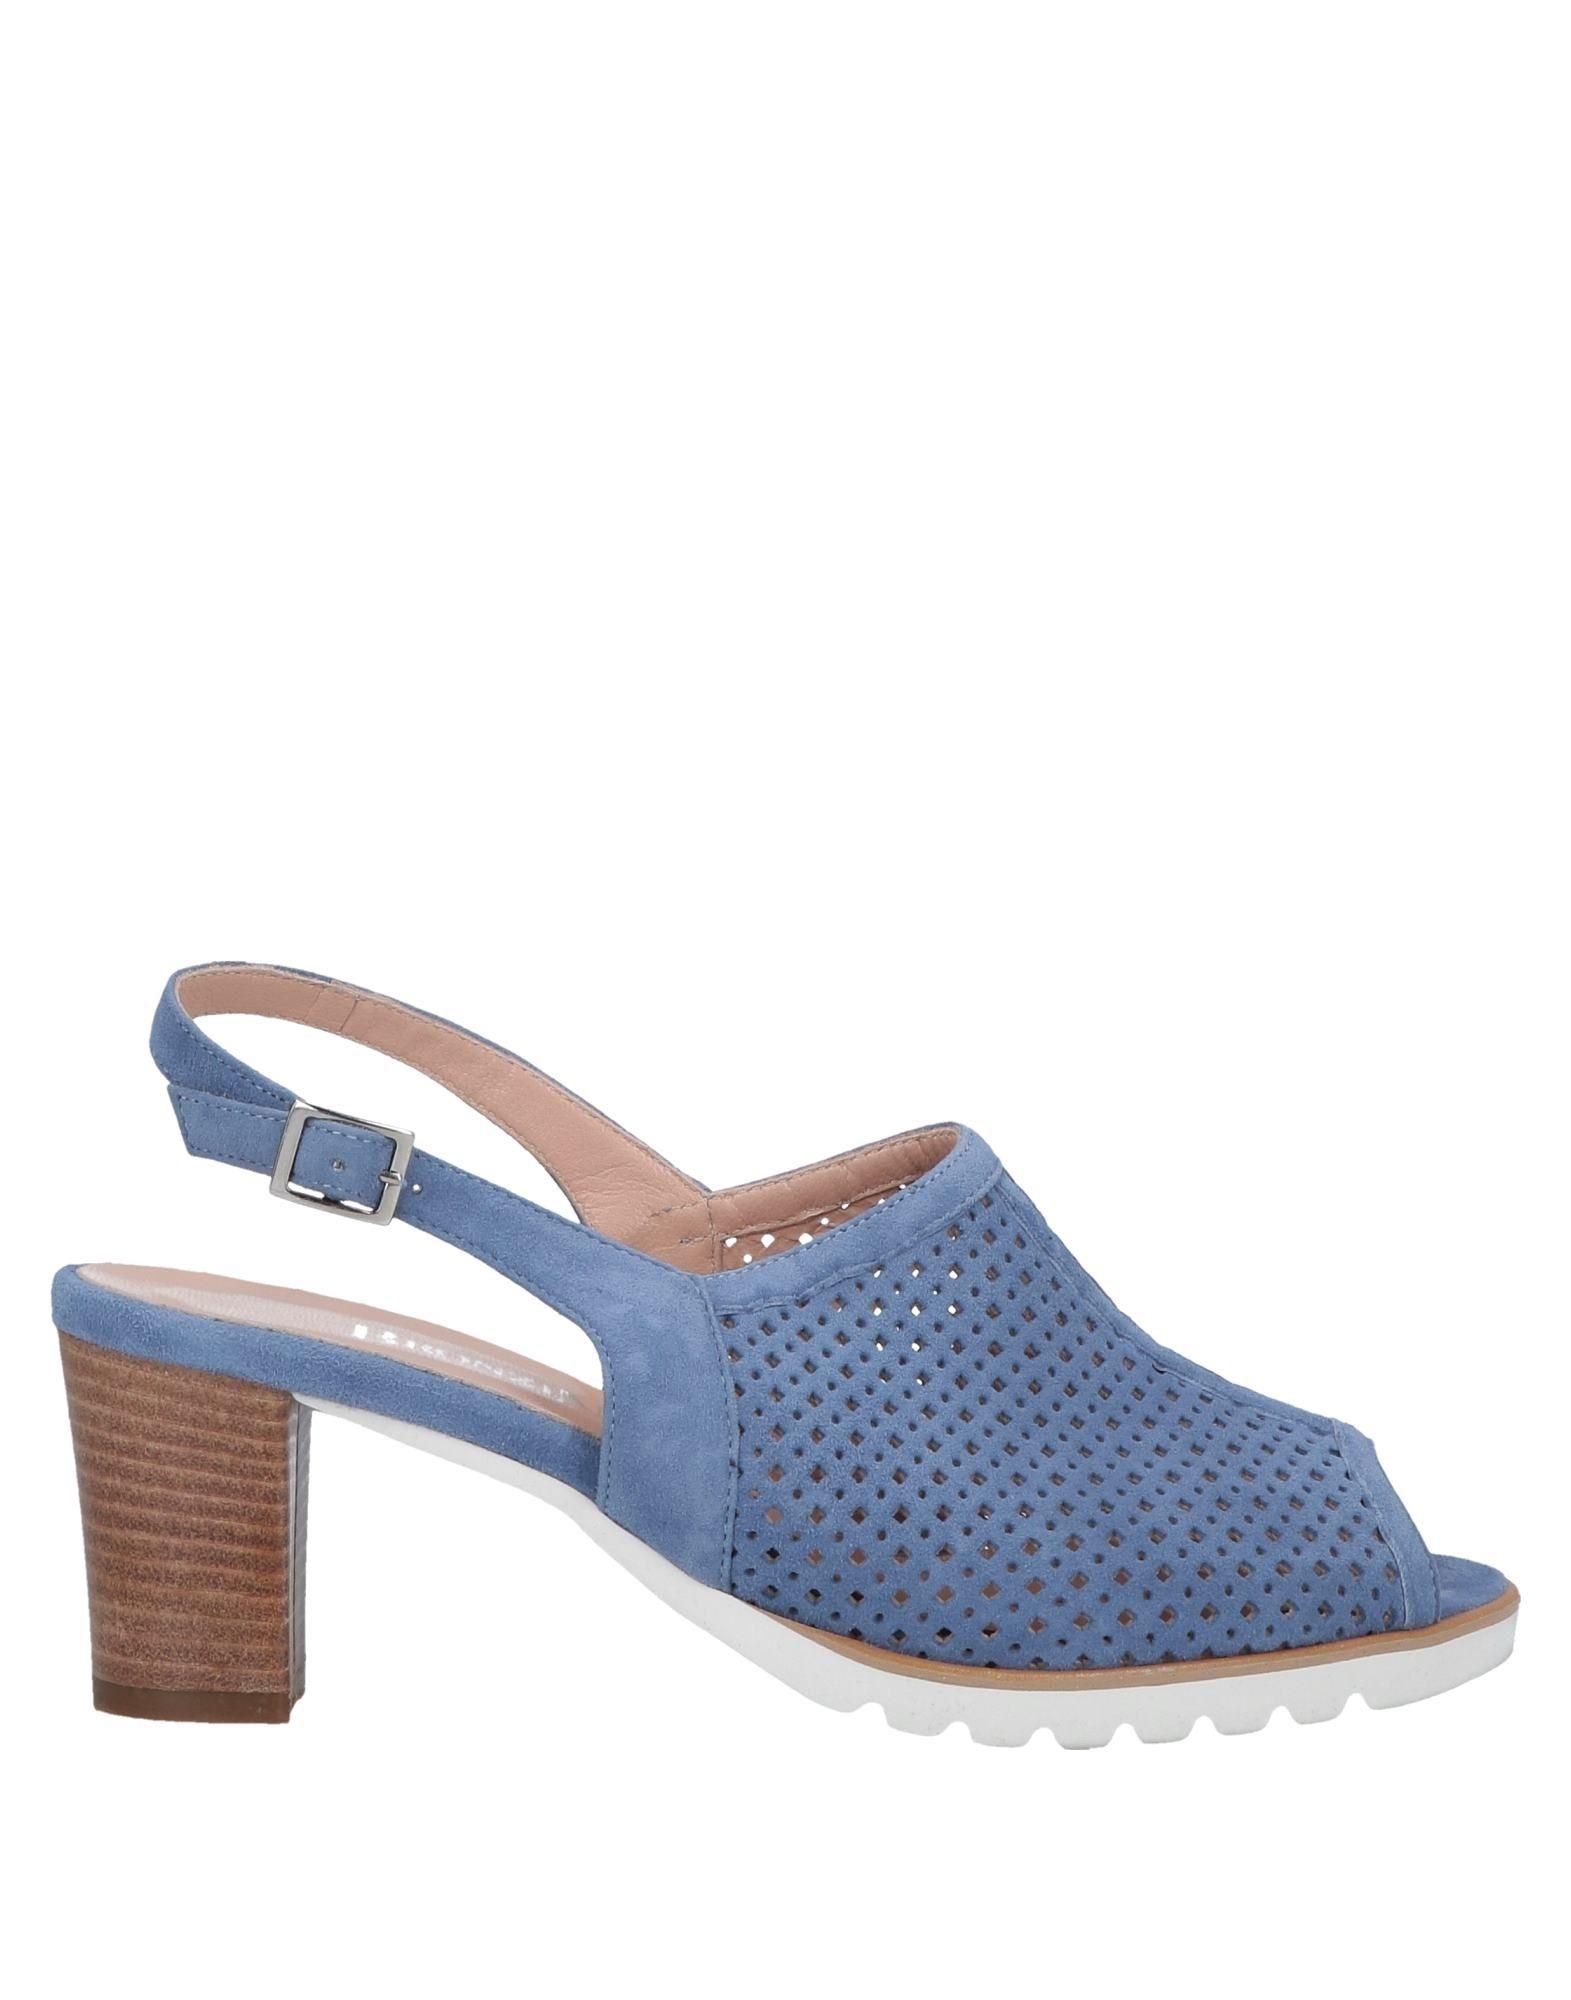 3fae46715 Sandals   Flip-Flops - Buy Best Sandals   Flip-Flops from Fashion  Influencers